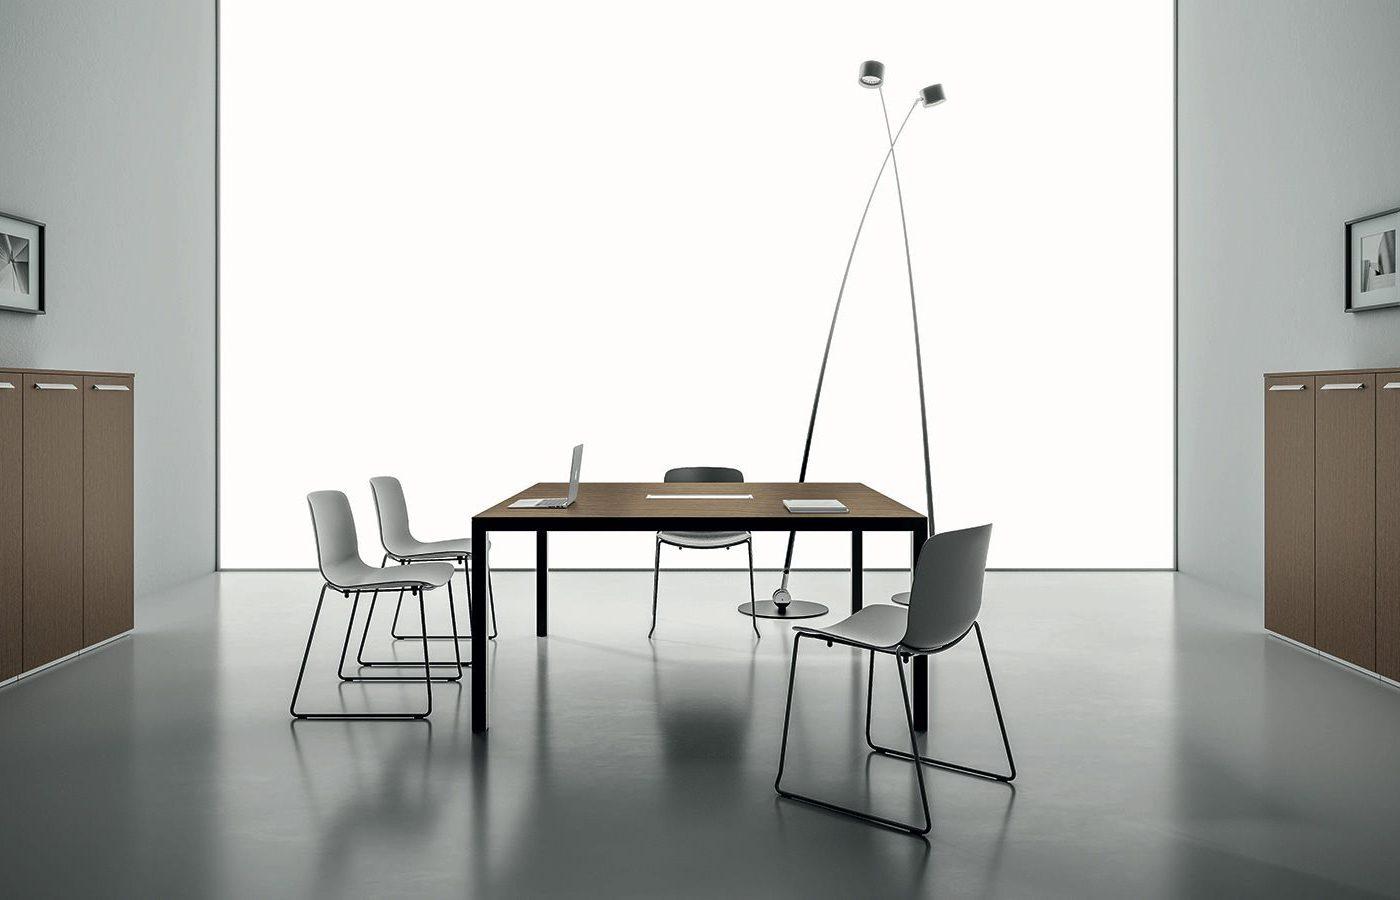 dvo_tavoli_DV990_executive-table_gallery_15_zoom